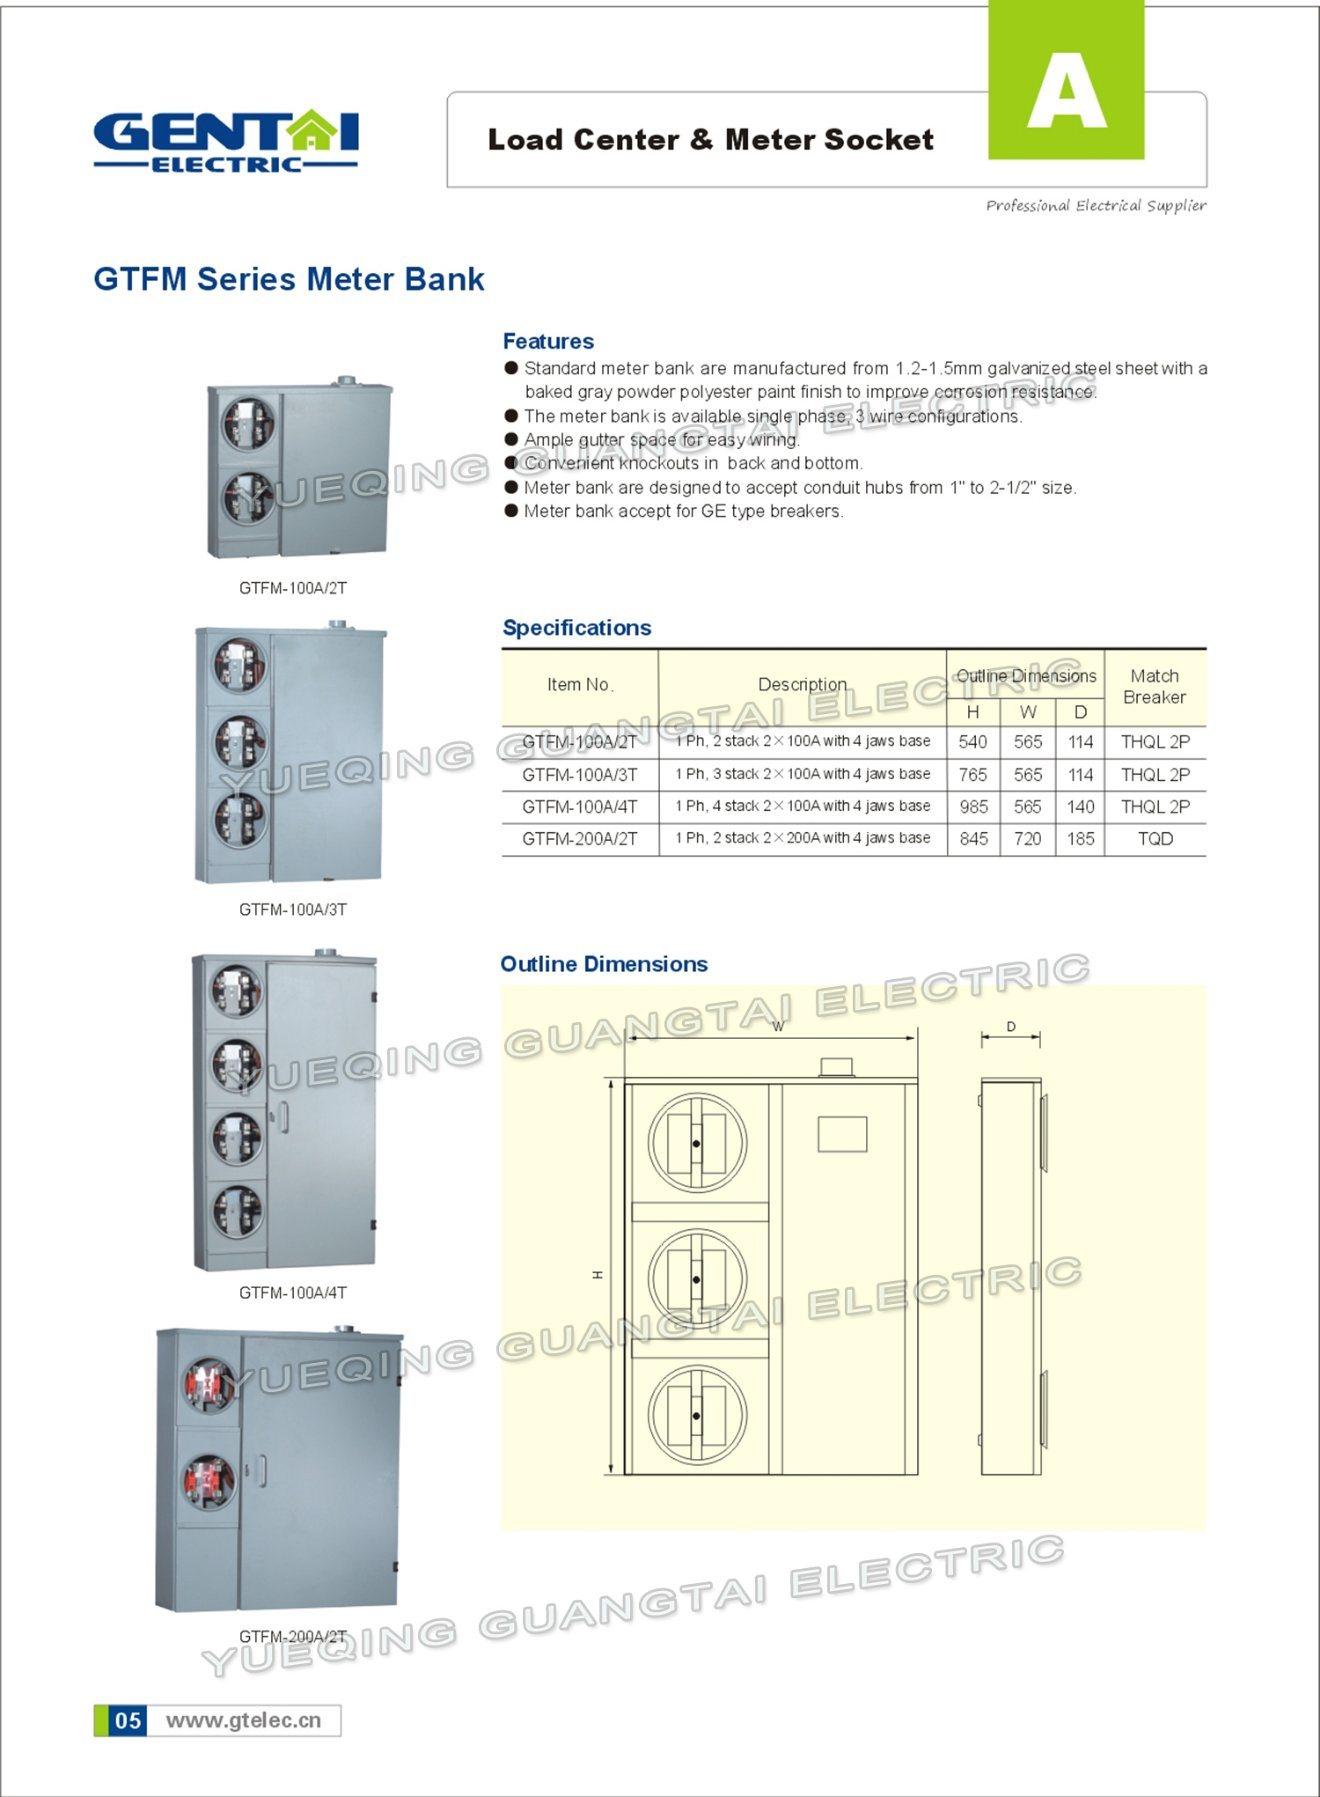 13 Terminal Meter Socket Wiring Diagram Trusted Diagrams 200 Amp Base Auto Electrical U2022 Pcb Circuit